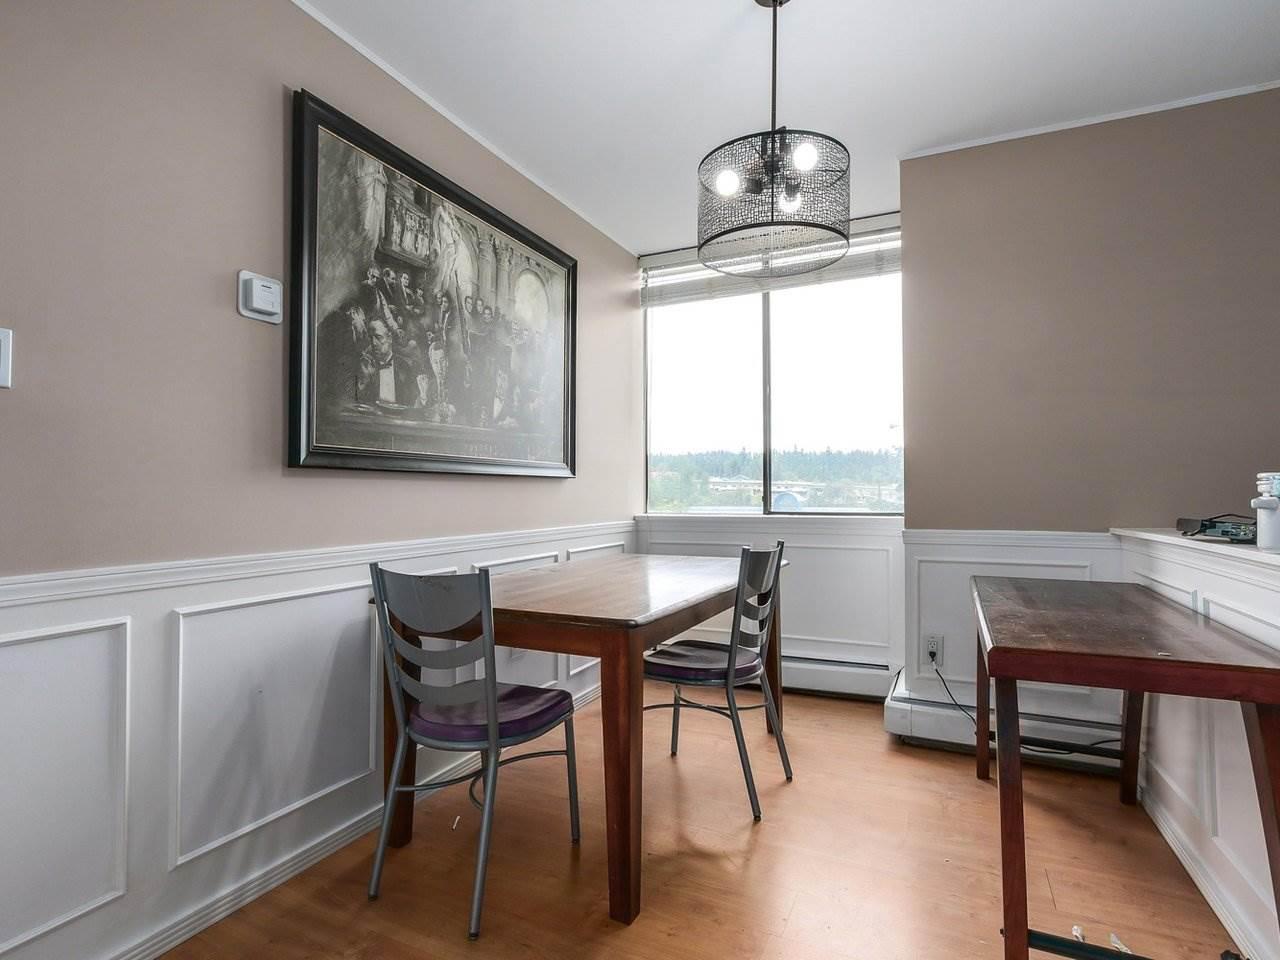 Condo Apartment at 905 3755 BARTLETT COURT, Unit 905, Burnaby North, British Columbia. Image 5